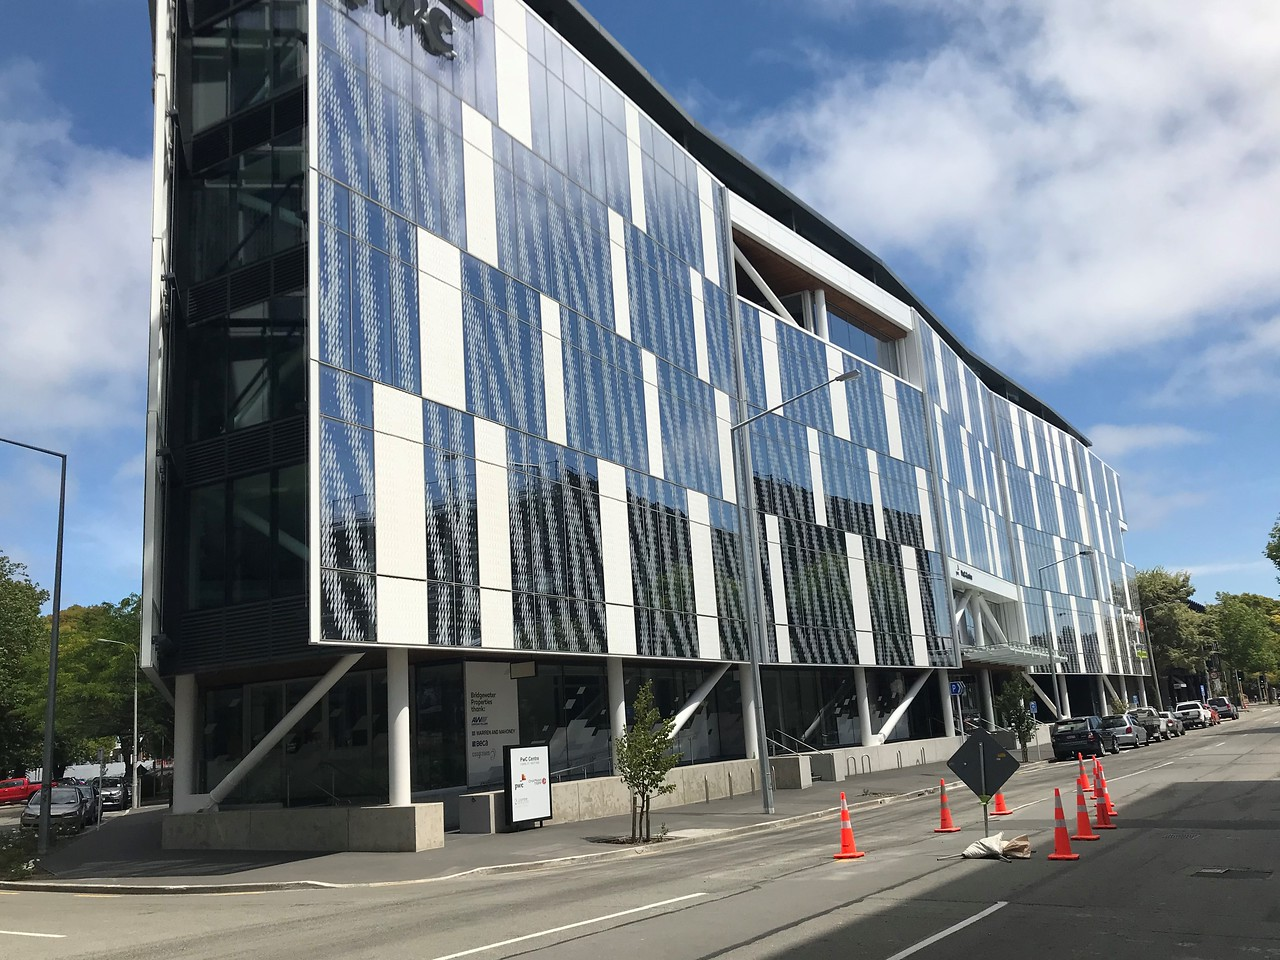 An interesting brand new modern building with a wavy façade.